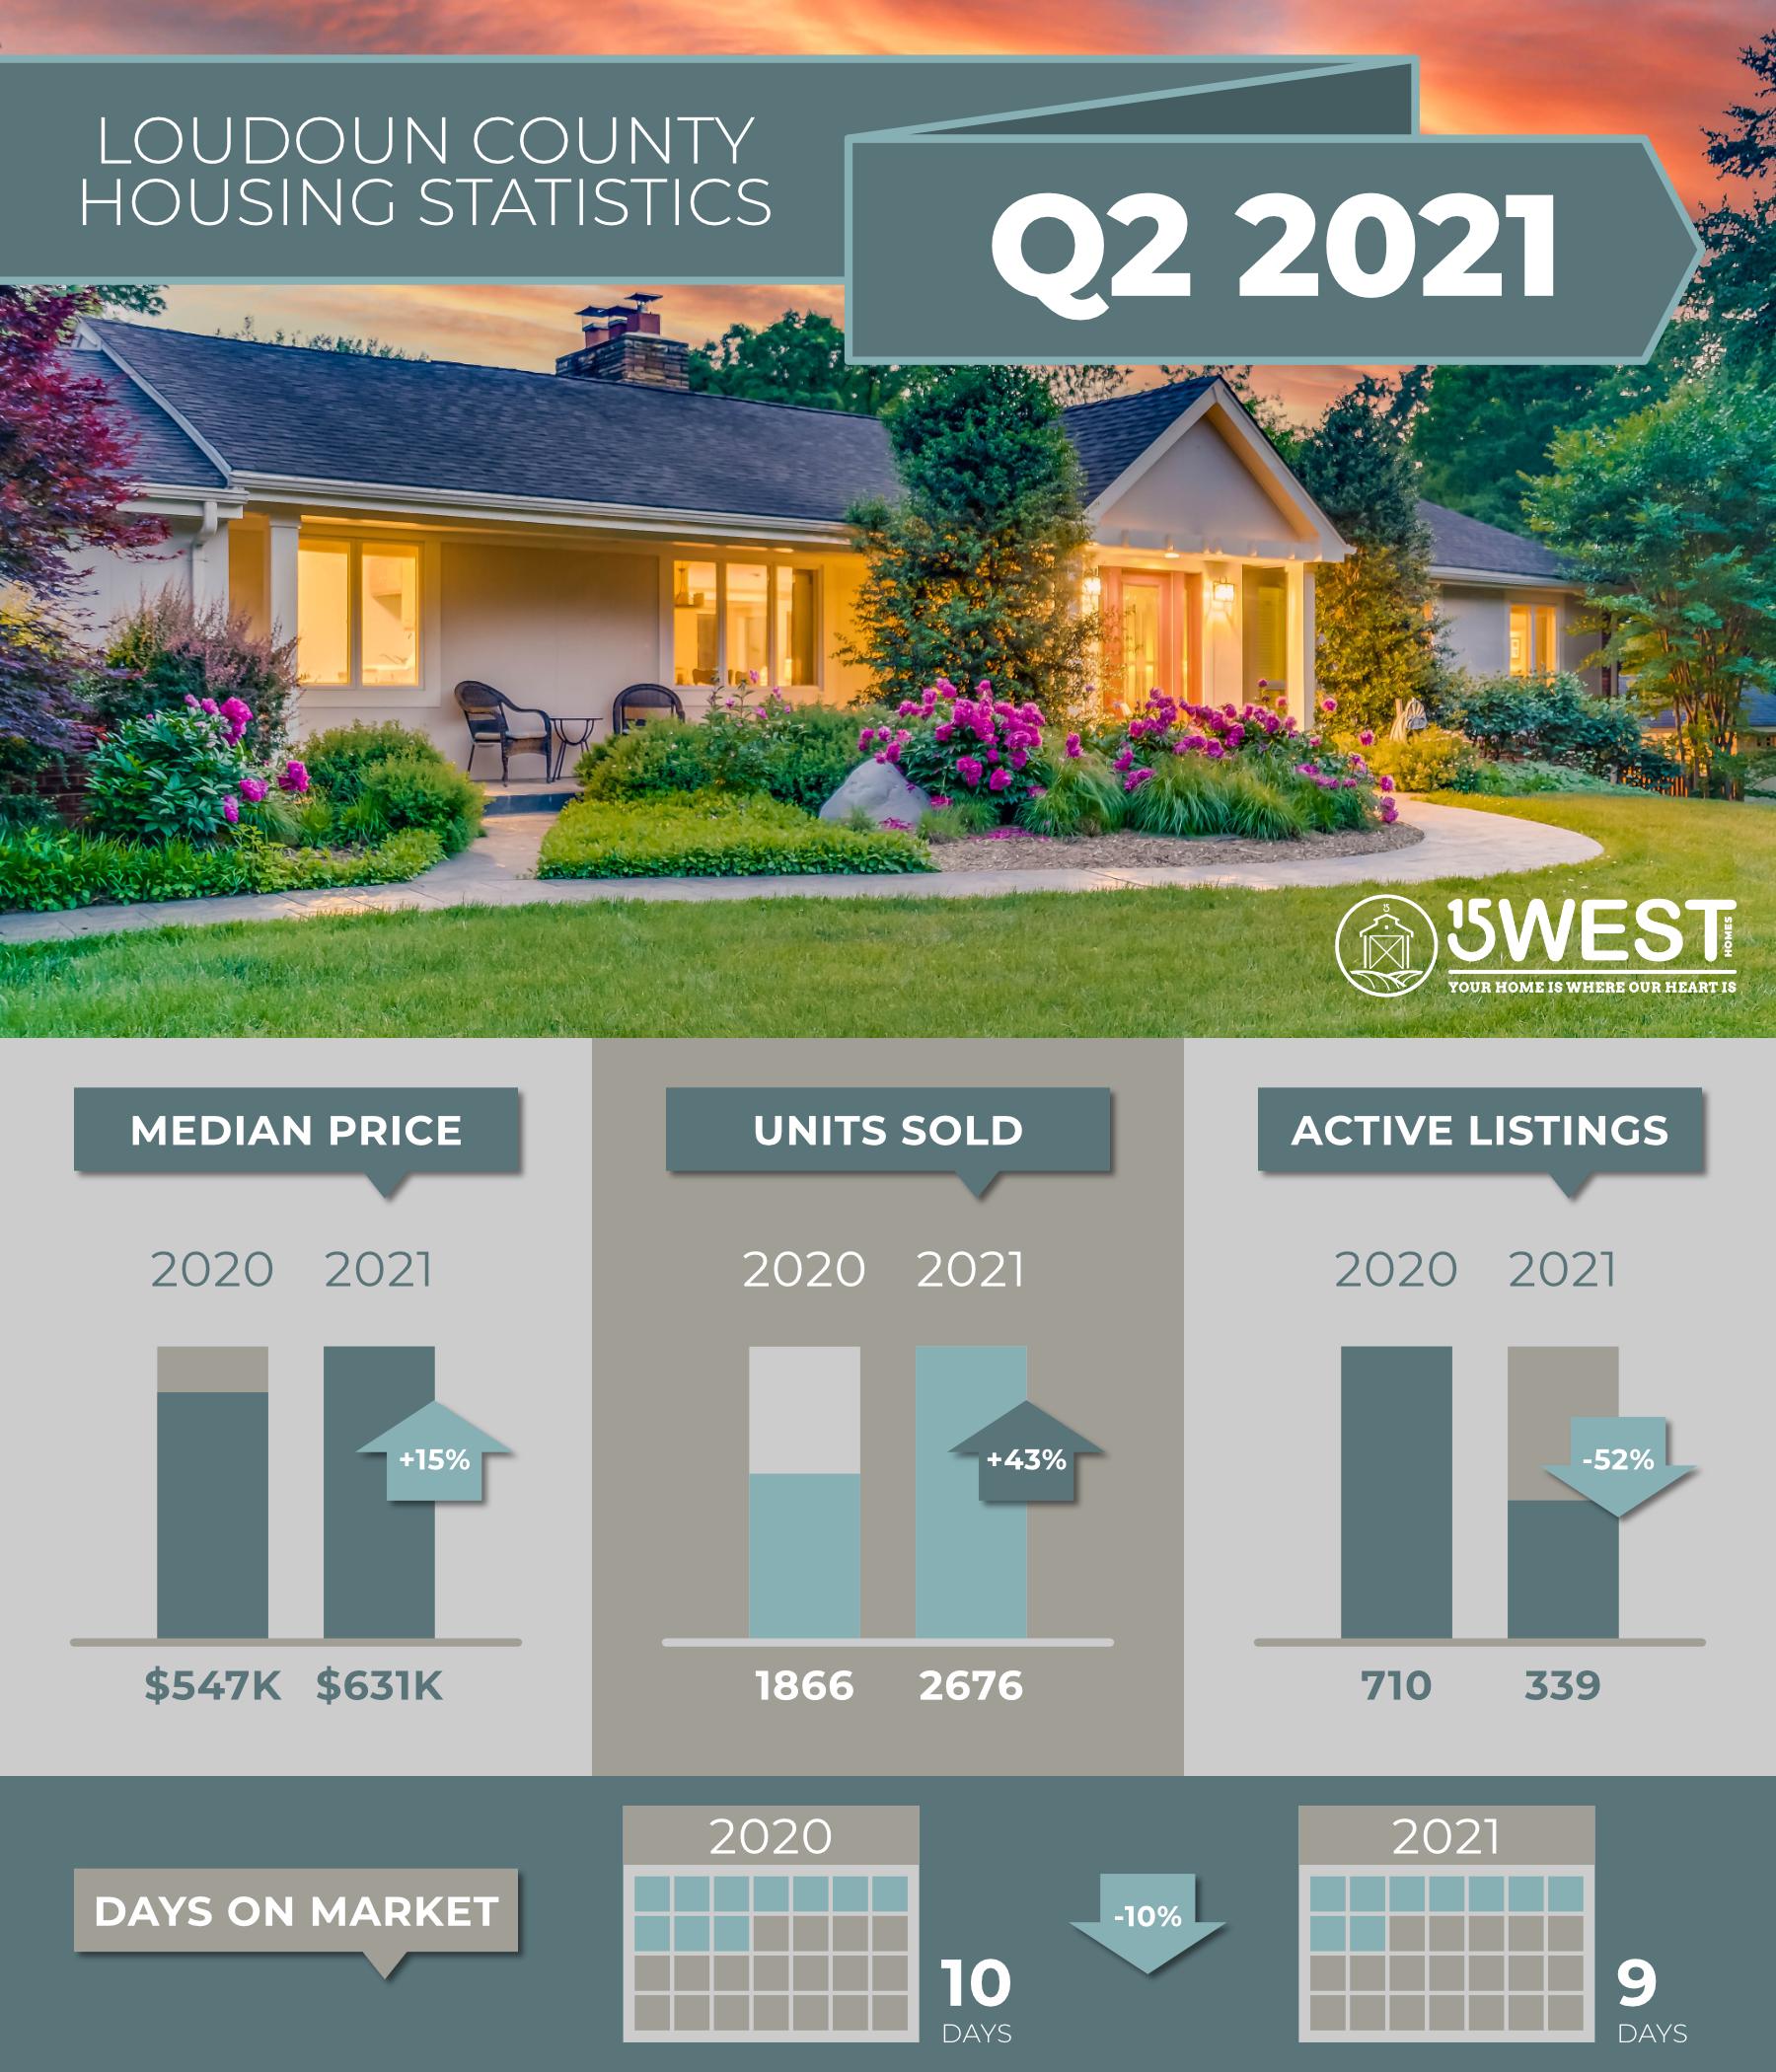 15 West Homes Q2 2021 Housing Stats